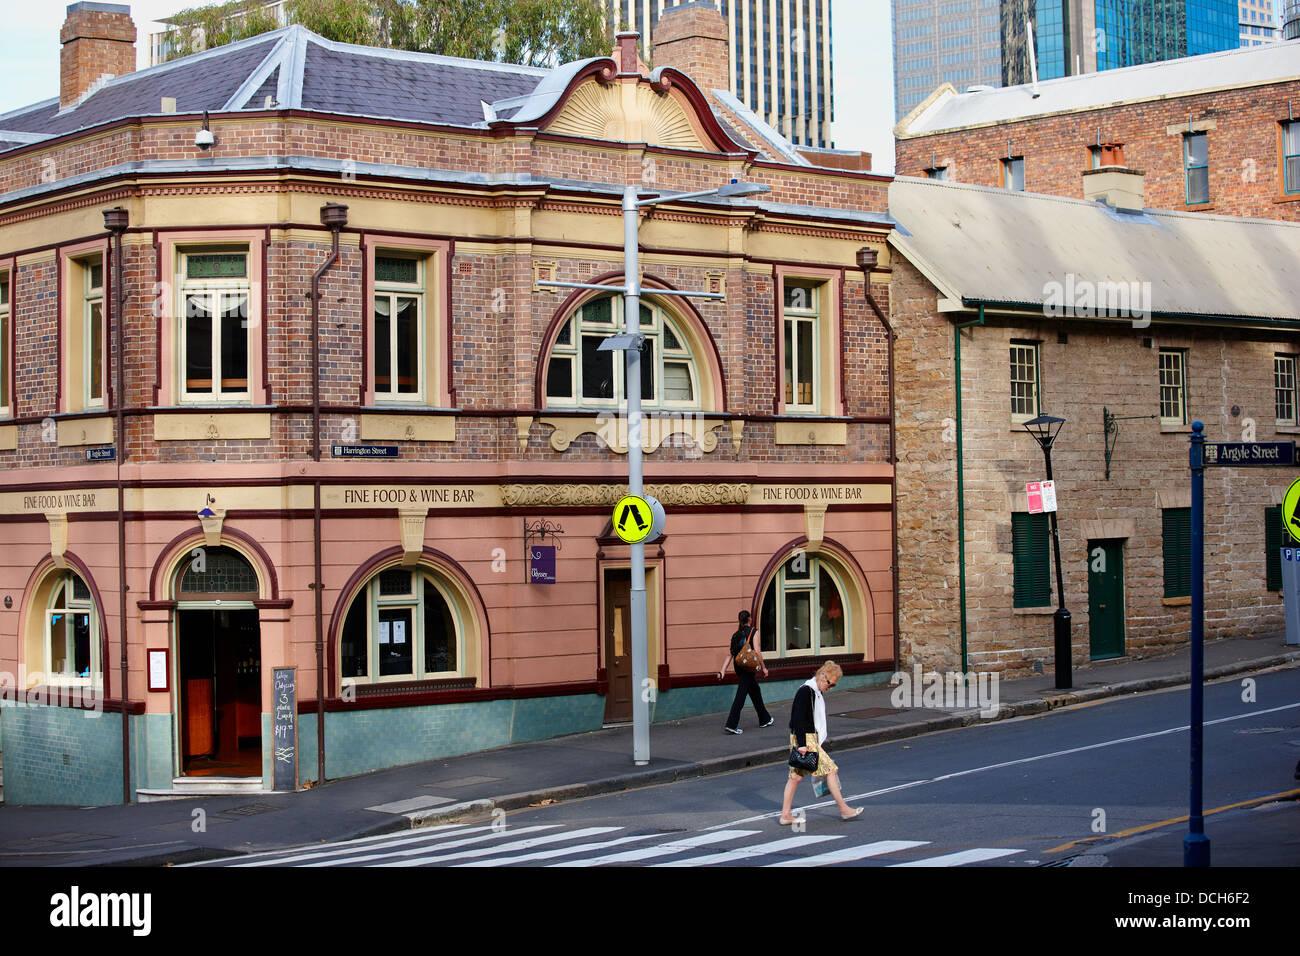 Fine Food & Wine Bar on Argyle Street, Sydney, Australia - Stock Image